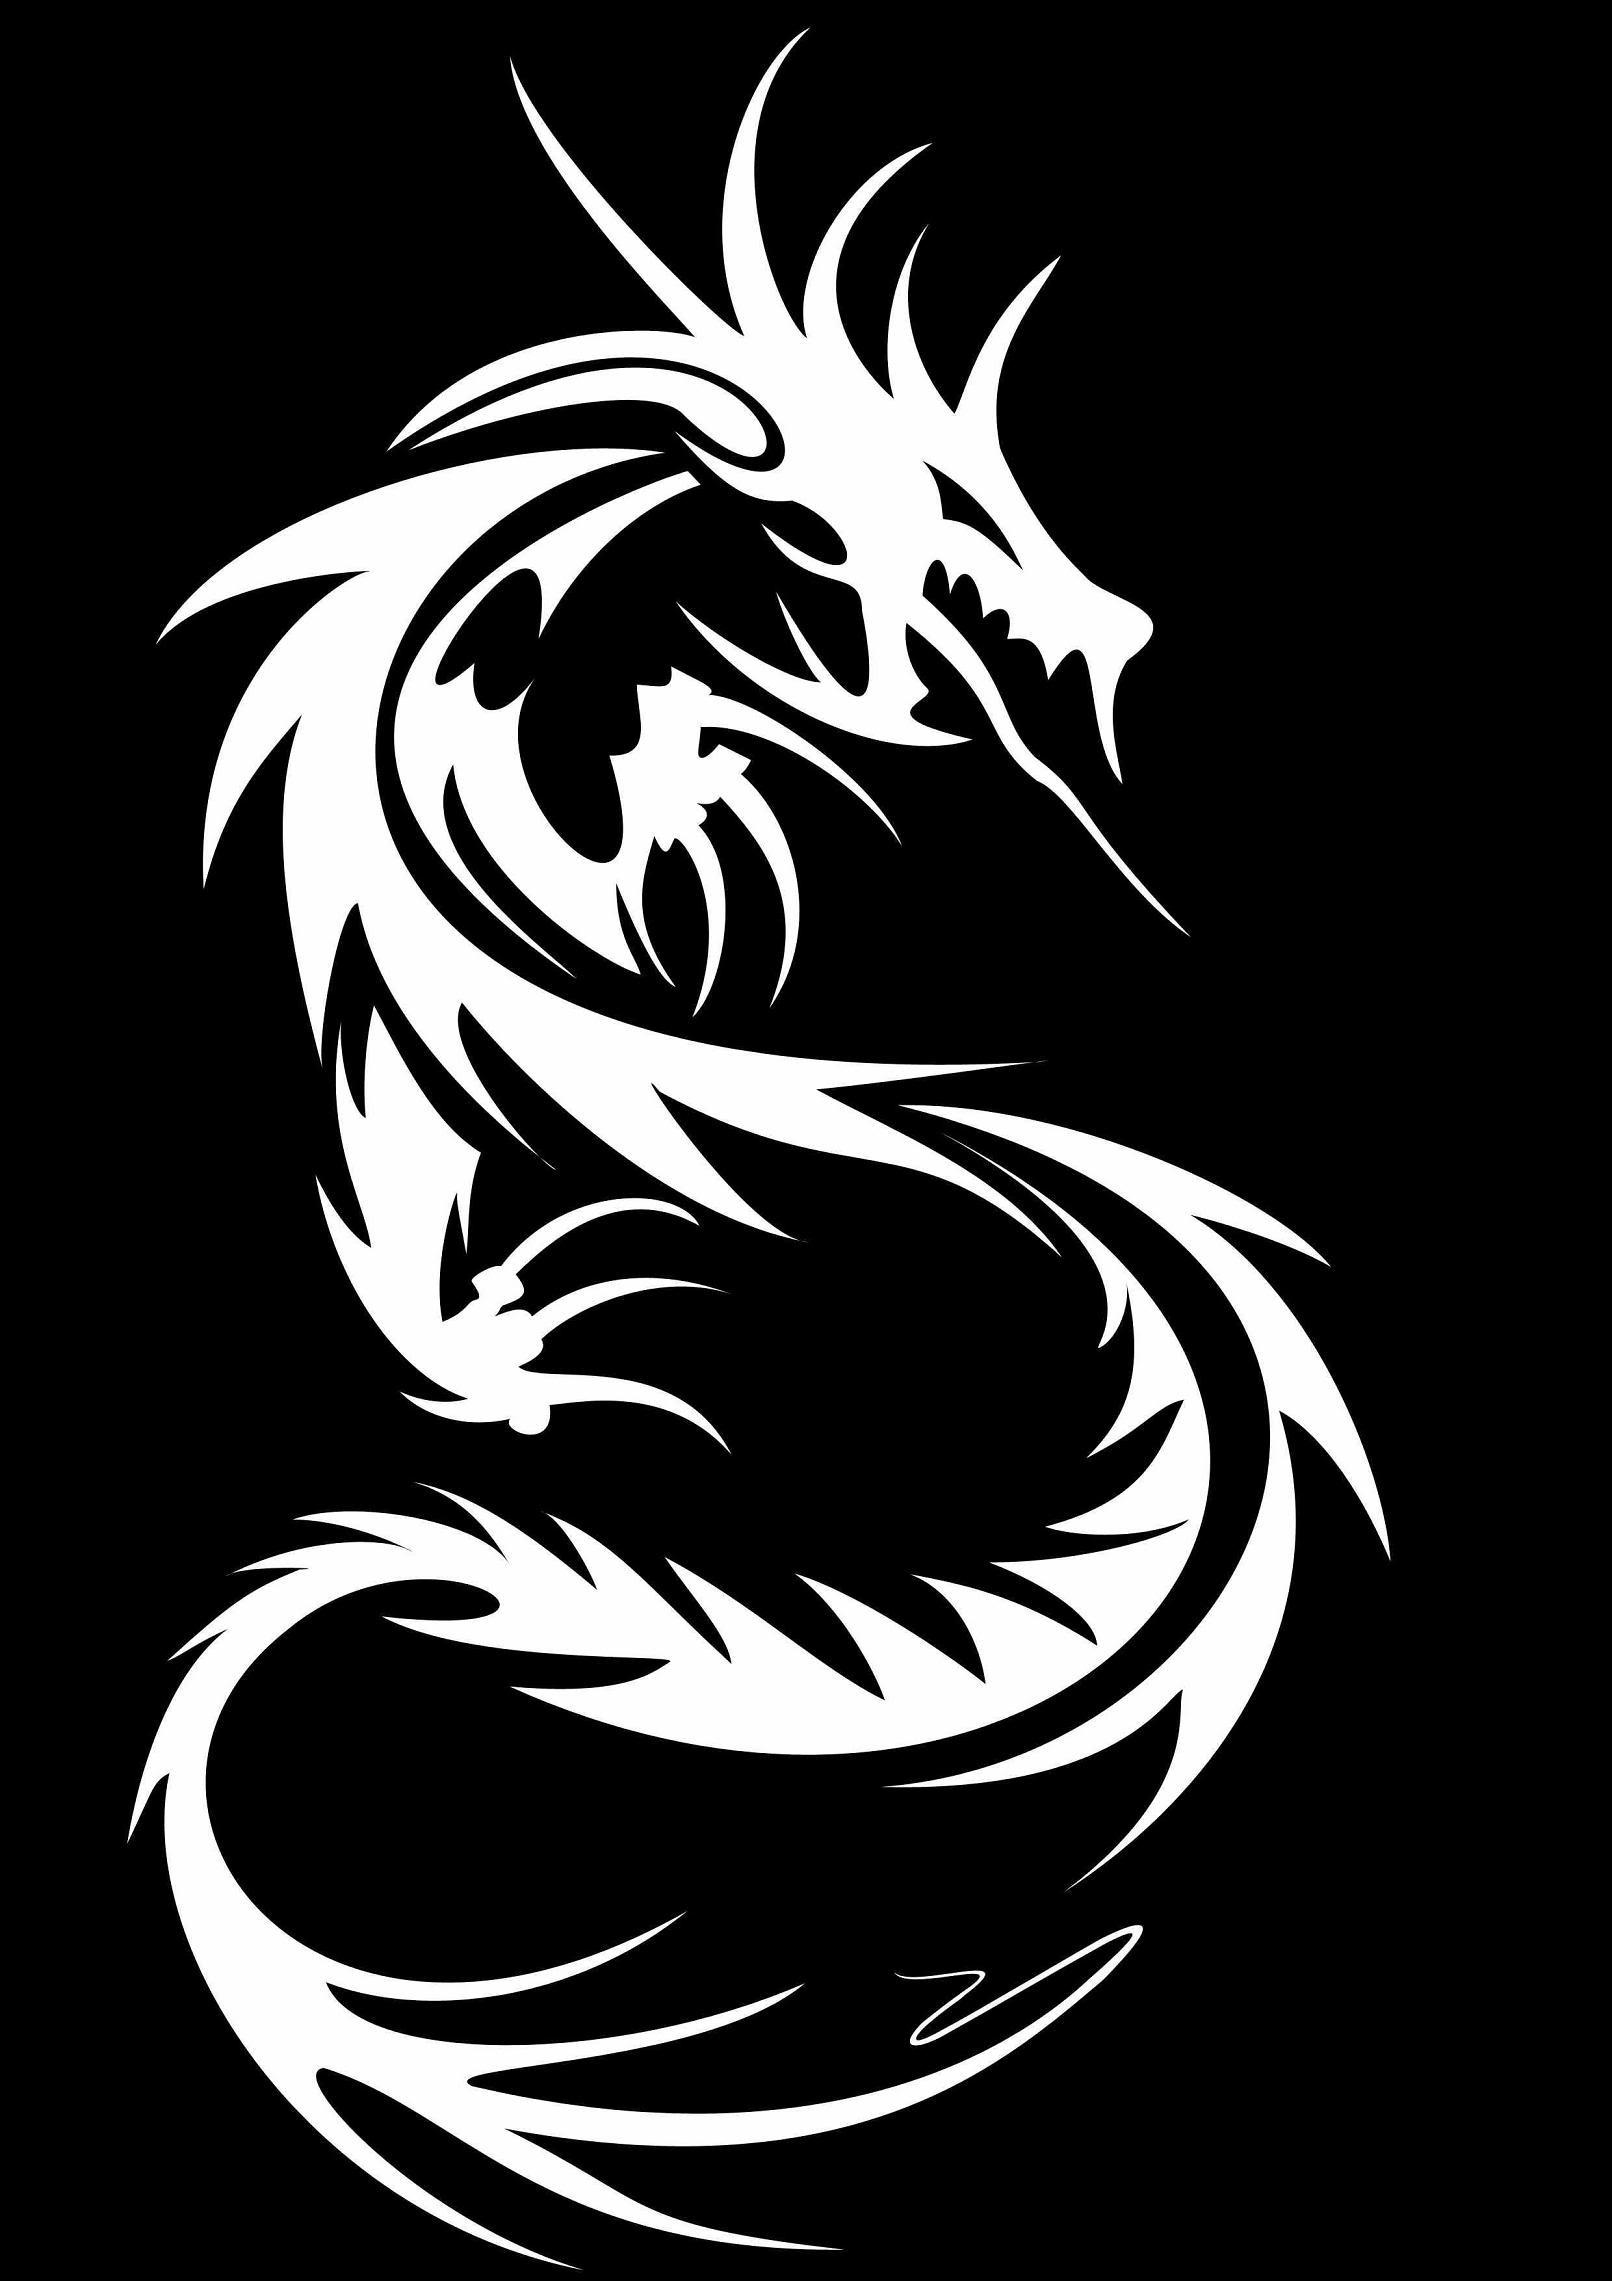 Yin Yang Dragon Wallpaper (49+ images)